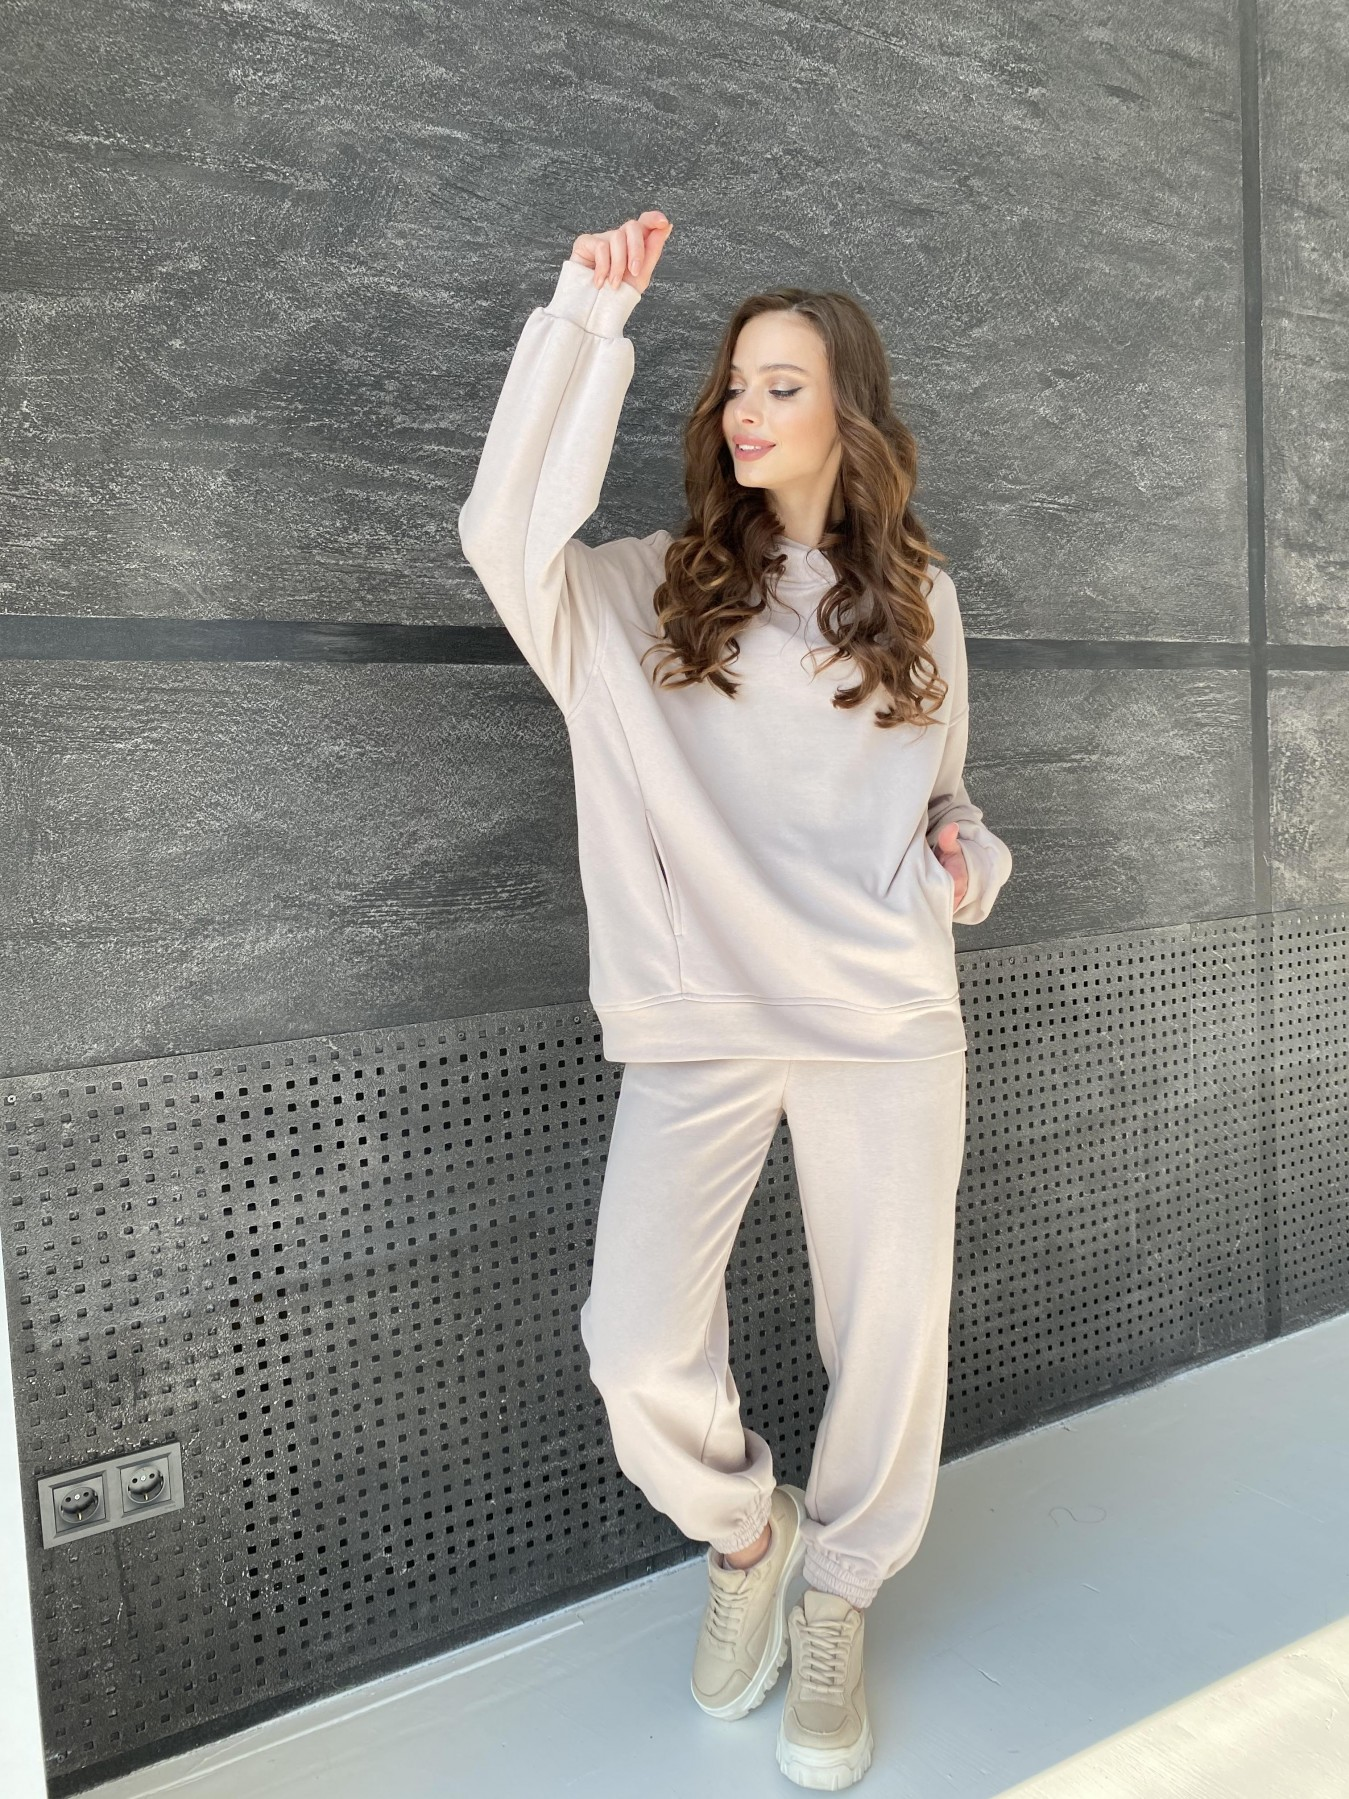 Марион костюм из 3х нитки 10581 АРТ. 46936 Цвет: Бежевый - фото 5, интернет магазин tm-modus.ru